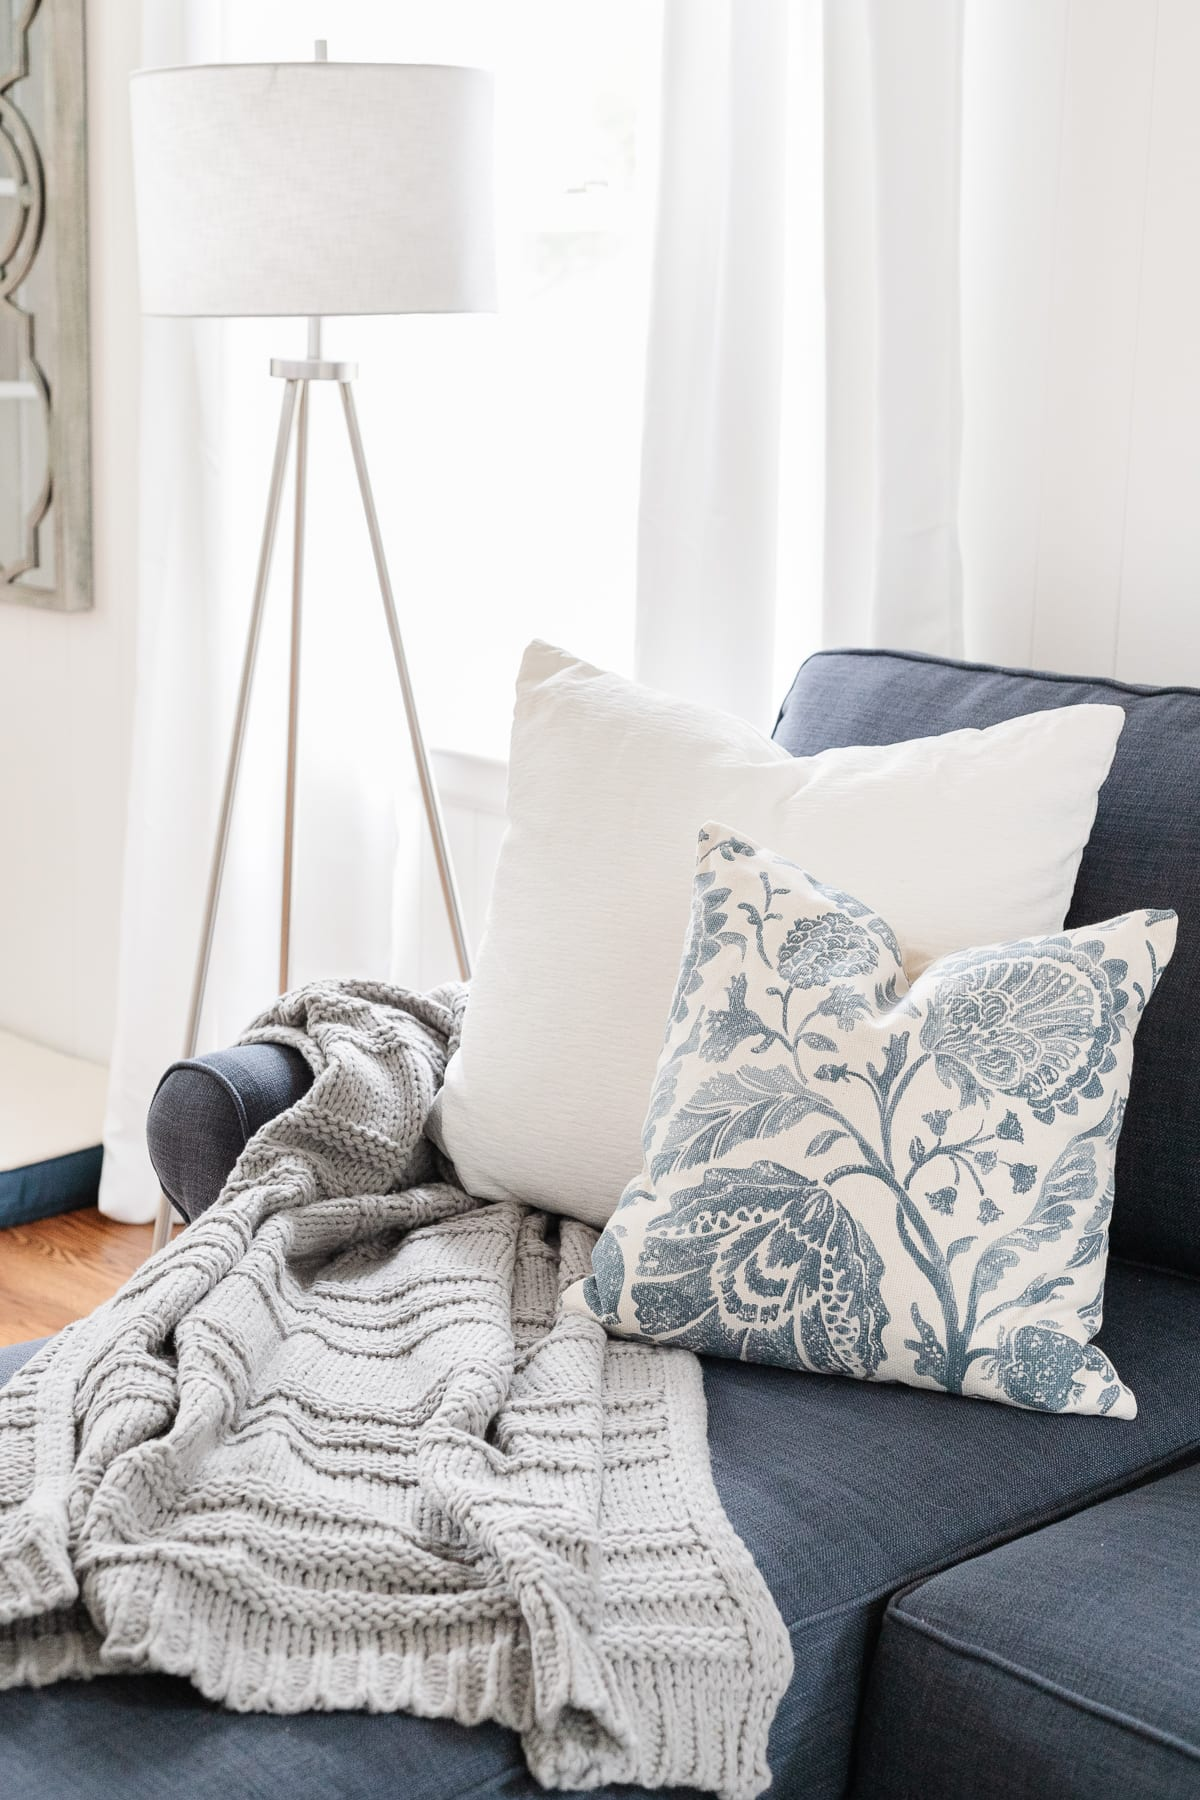 coastal style living room sofa with throw pillows